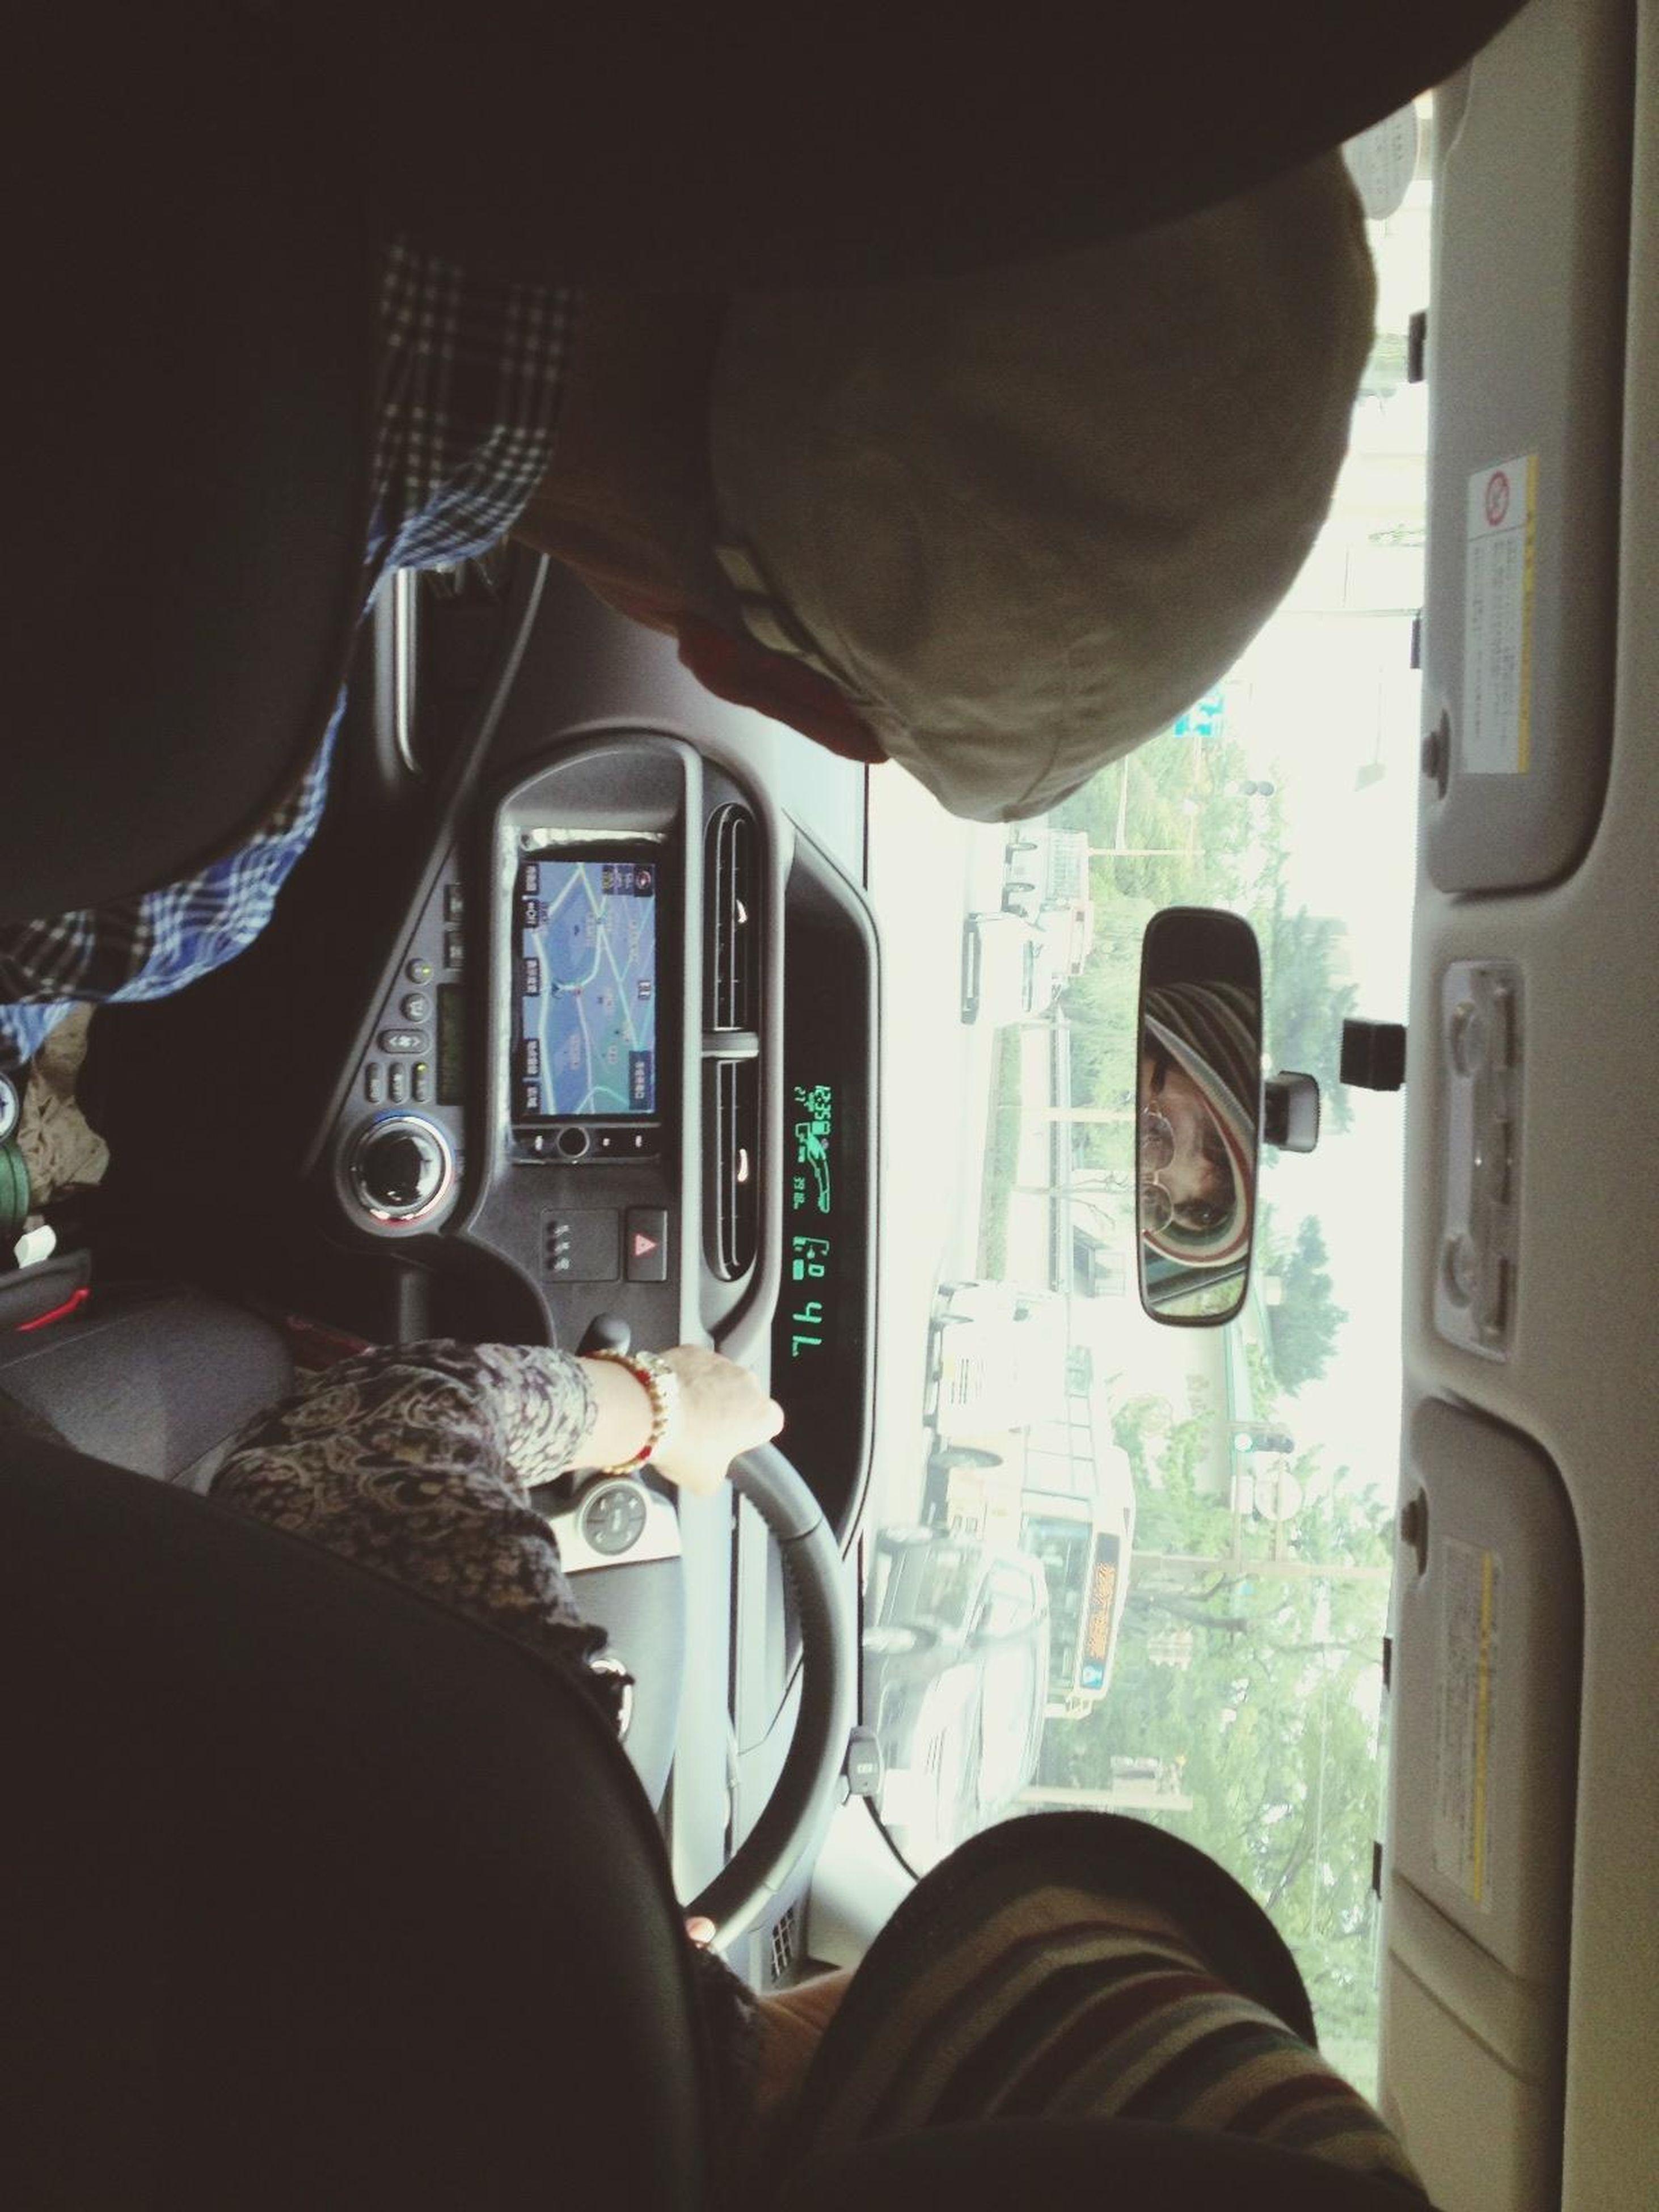 transportation, mode of transport, vehicle interior, indoors, land vehicle, men, car, lifestyles, window, vehicle seat, travel, leisure activity, sitting, journey, bus, person, technology, public transportation